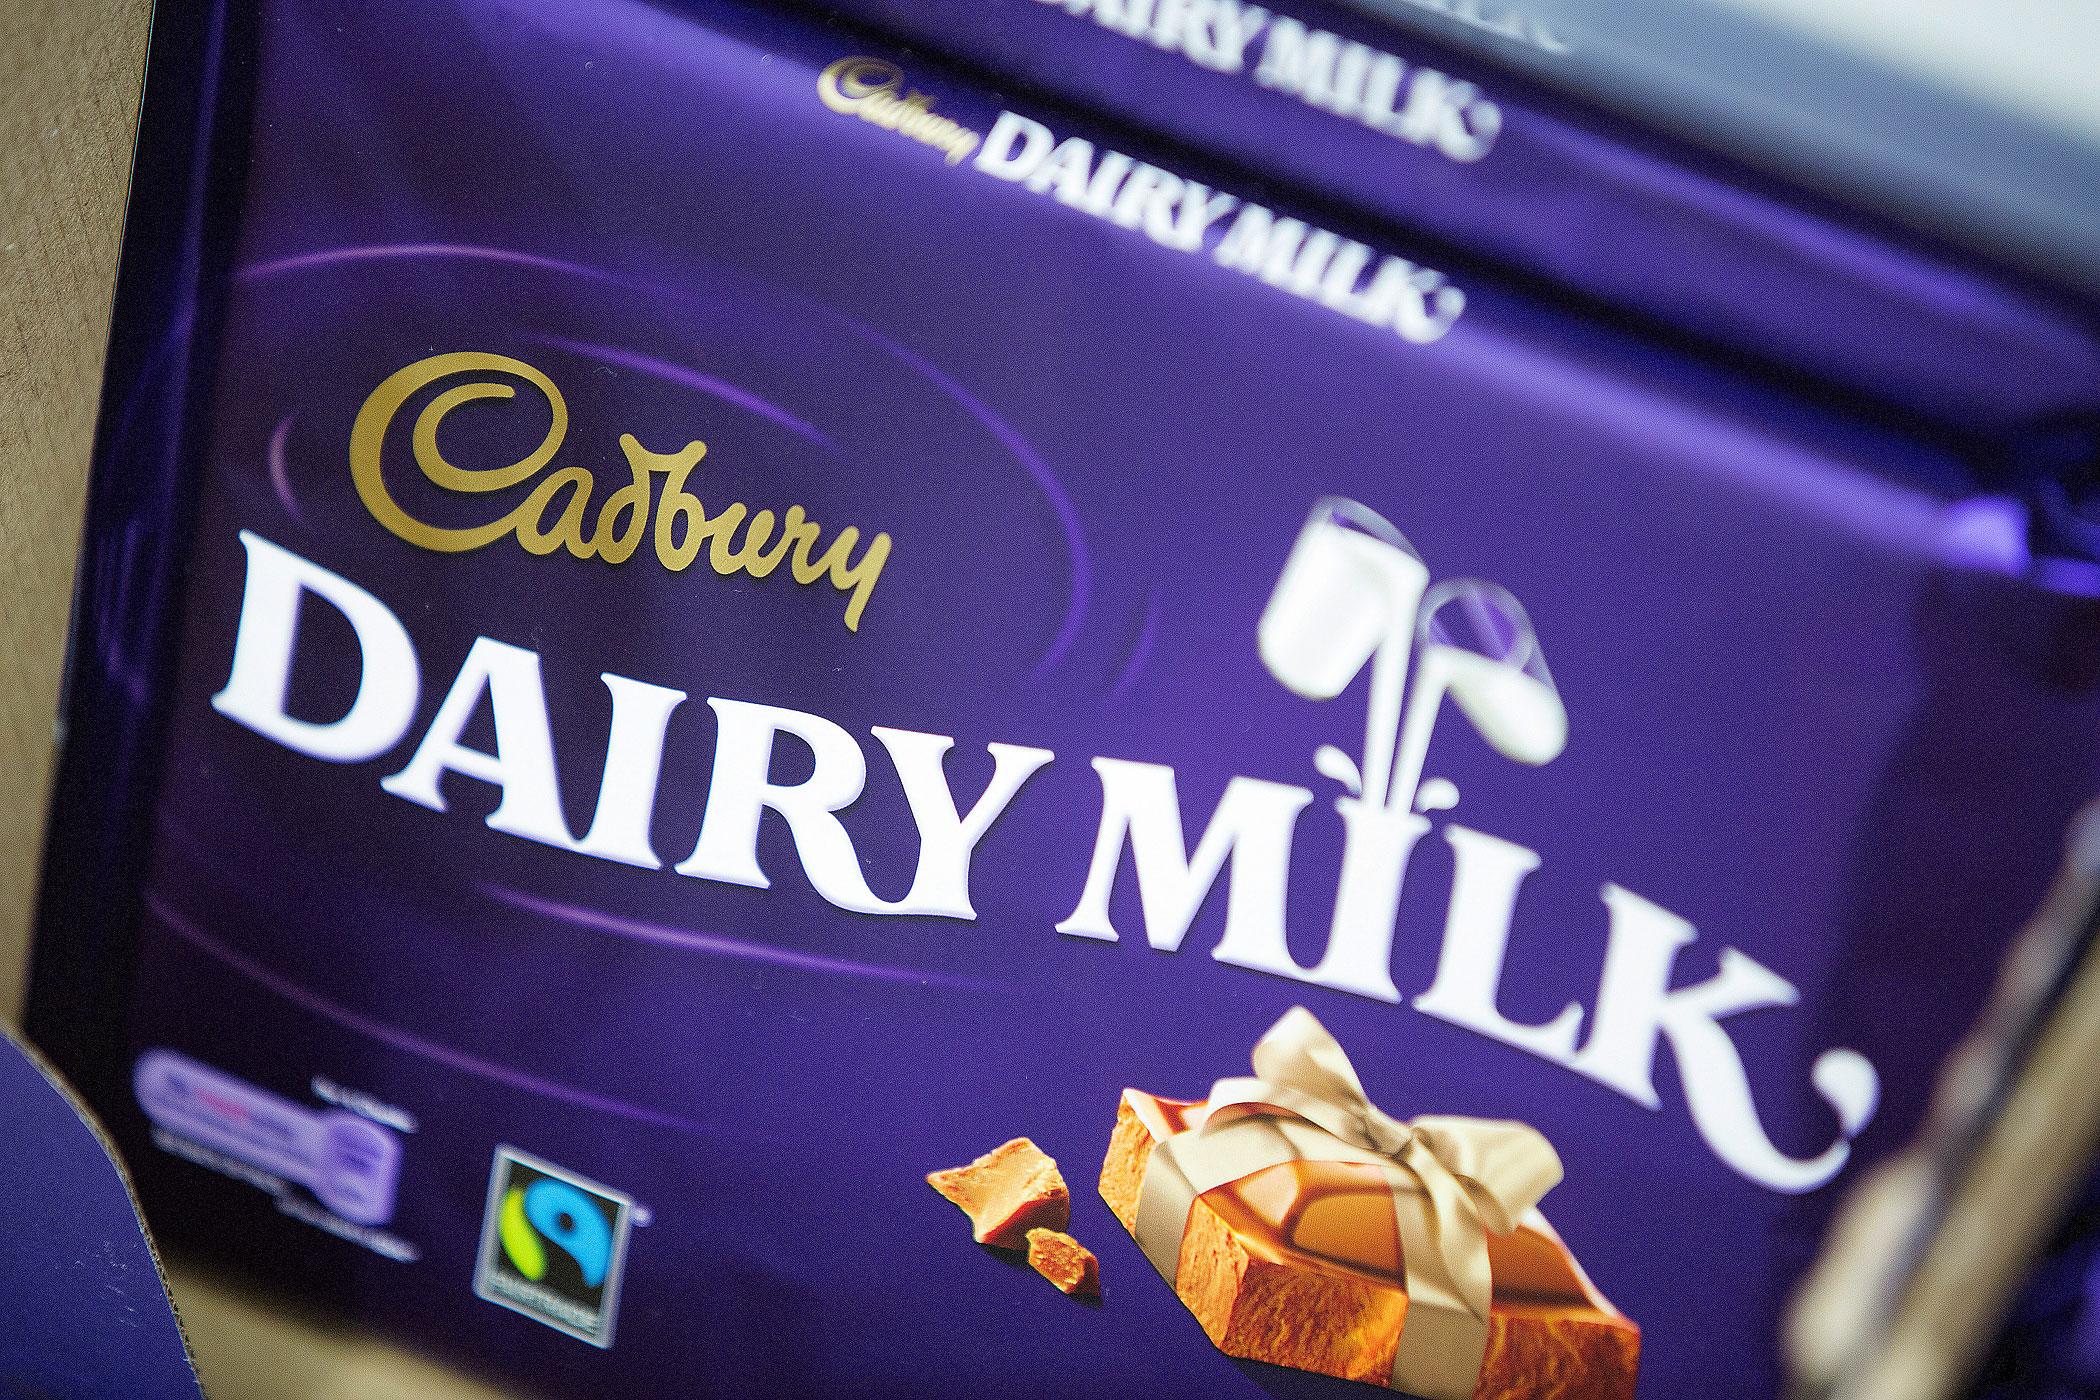 Cadbury  Dairy Milk  chocolate is displayed for sale inside an Asda supermarket in Watford, U.K., on Oct. 17, 2013.